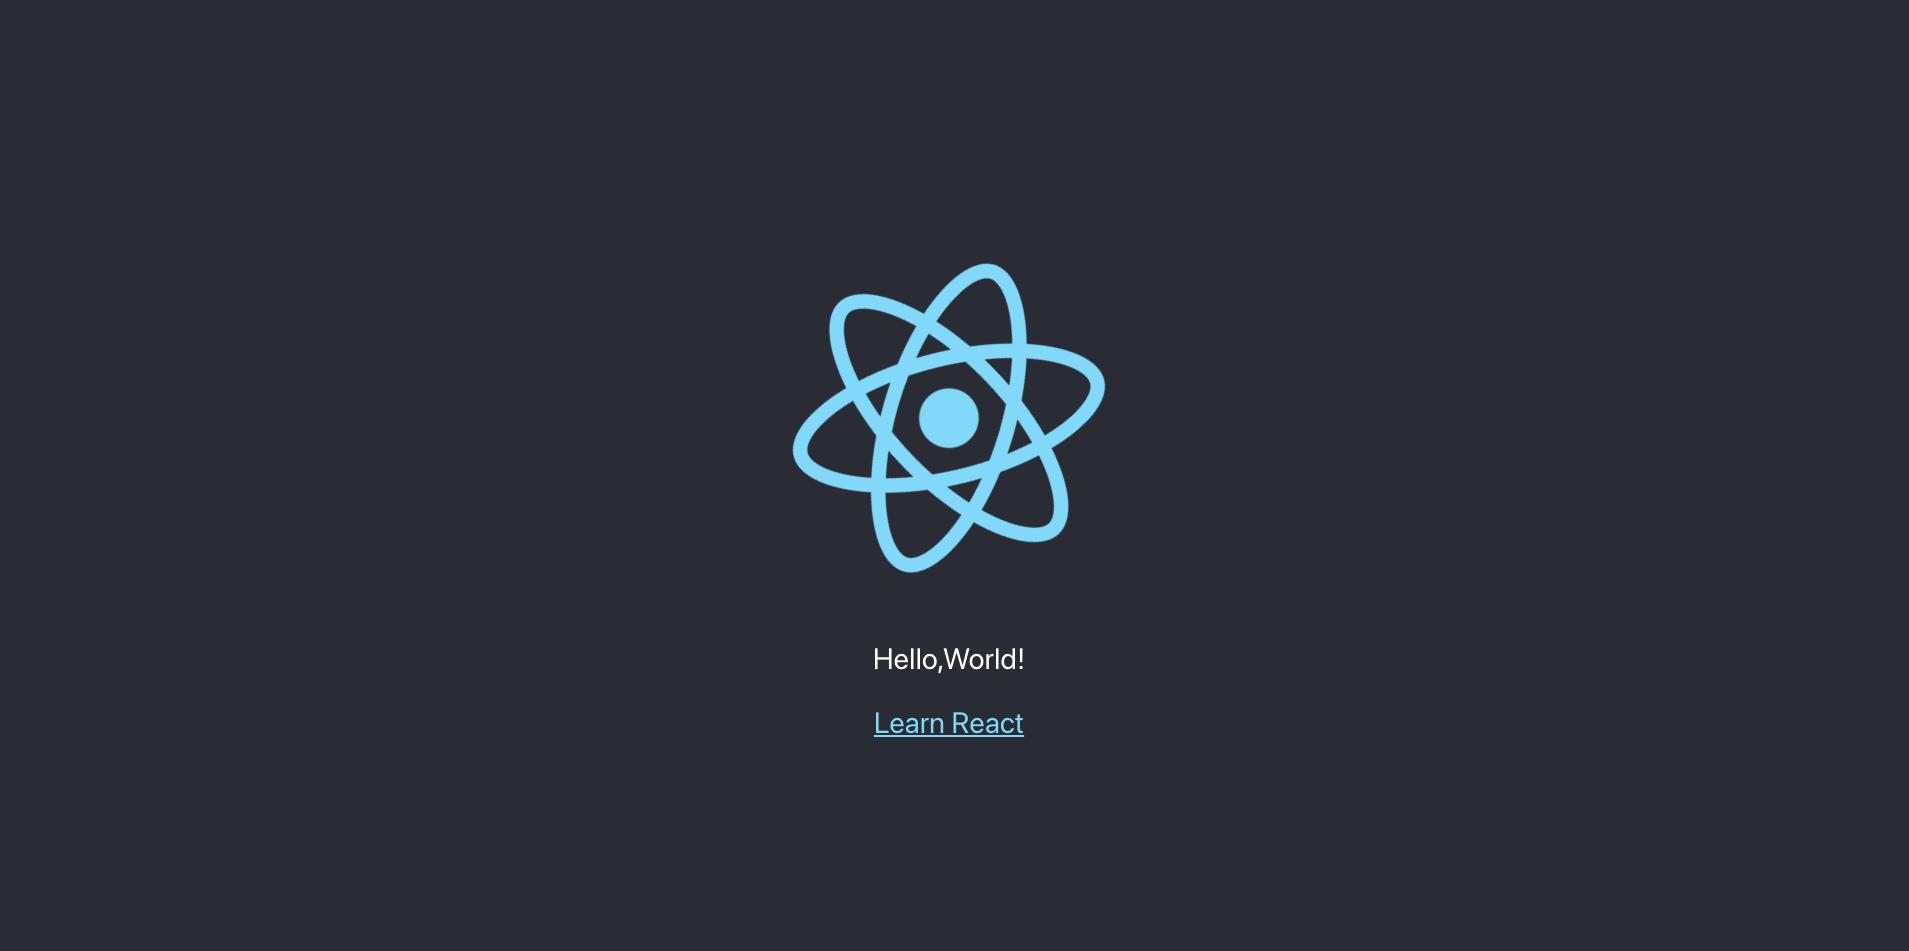 create-react-app の中身を解説。「hello world」を出力してみよう